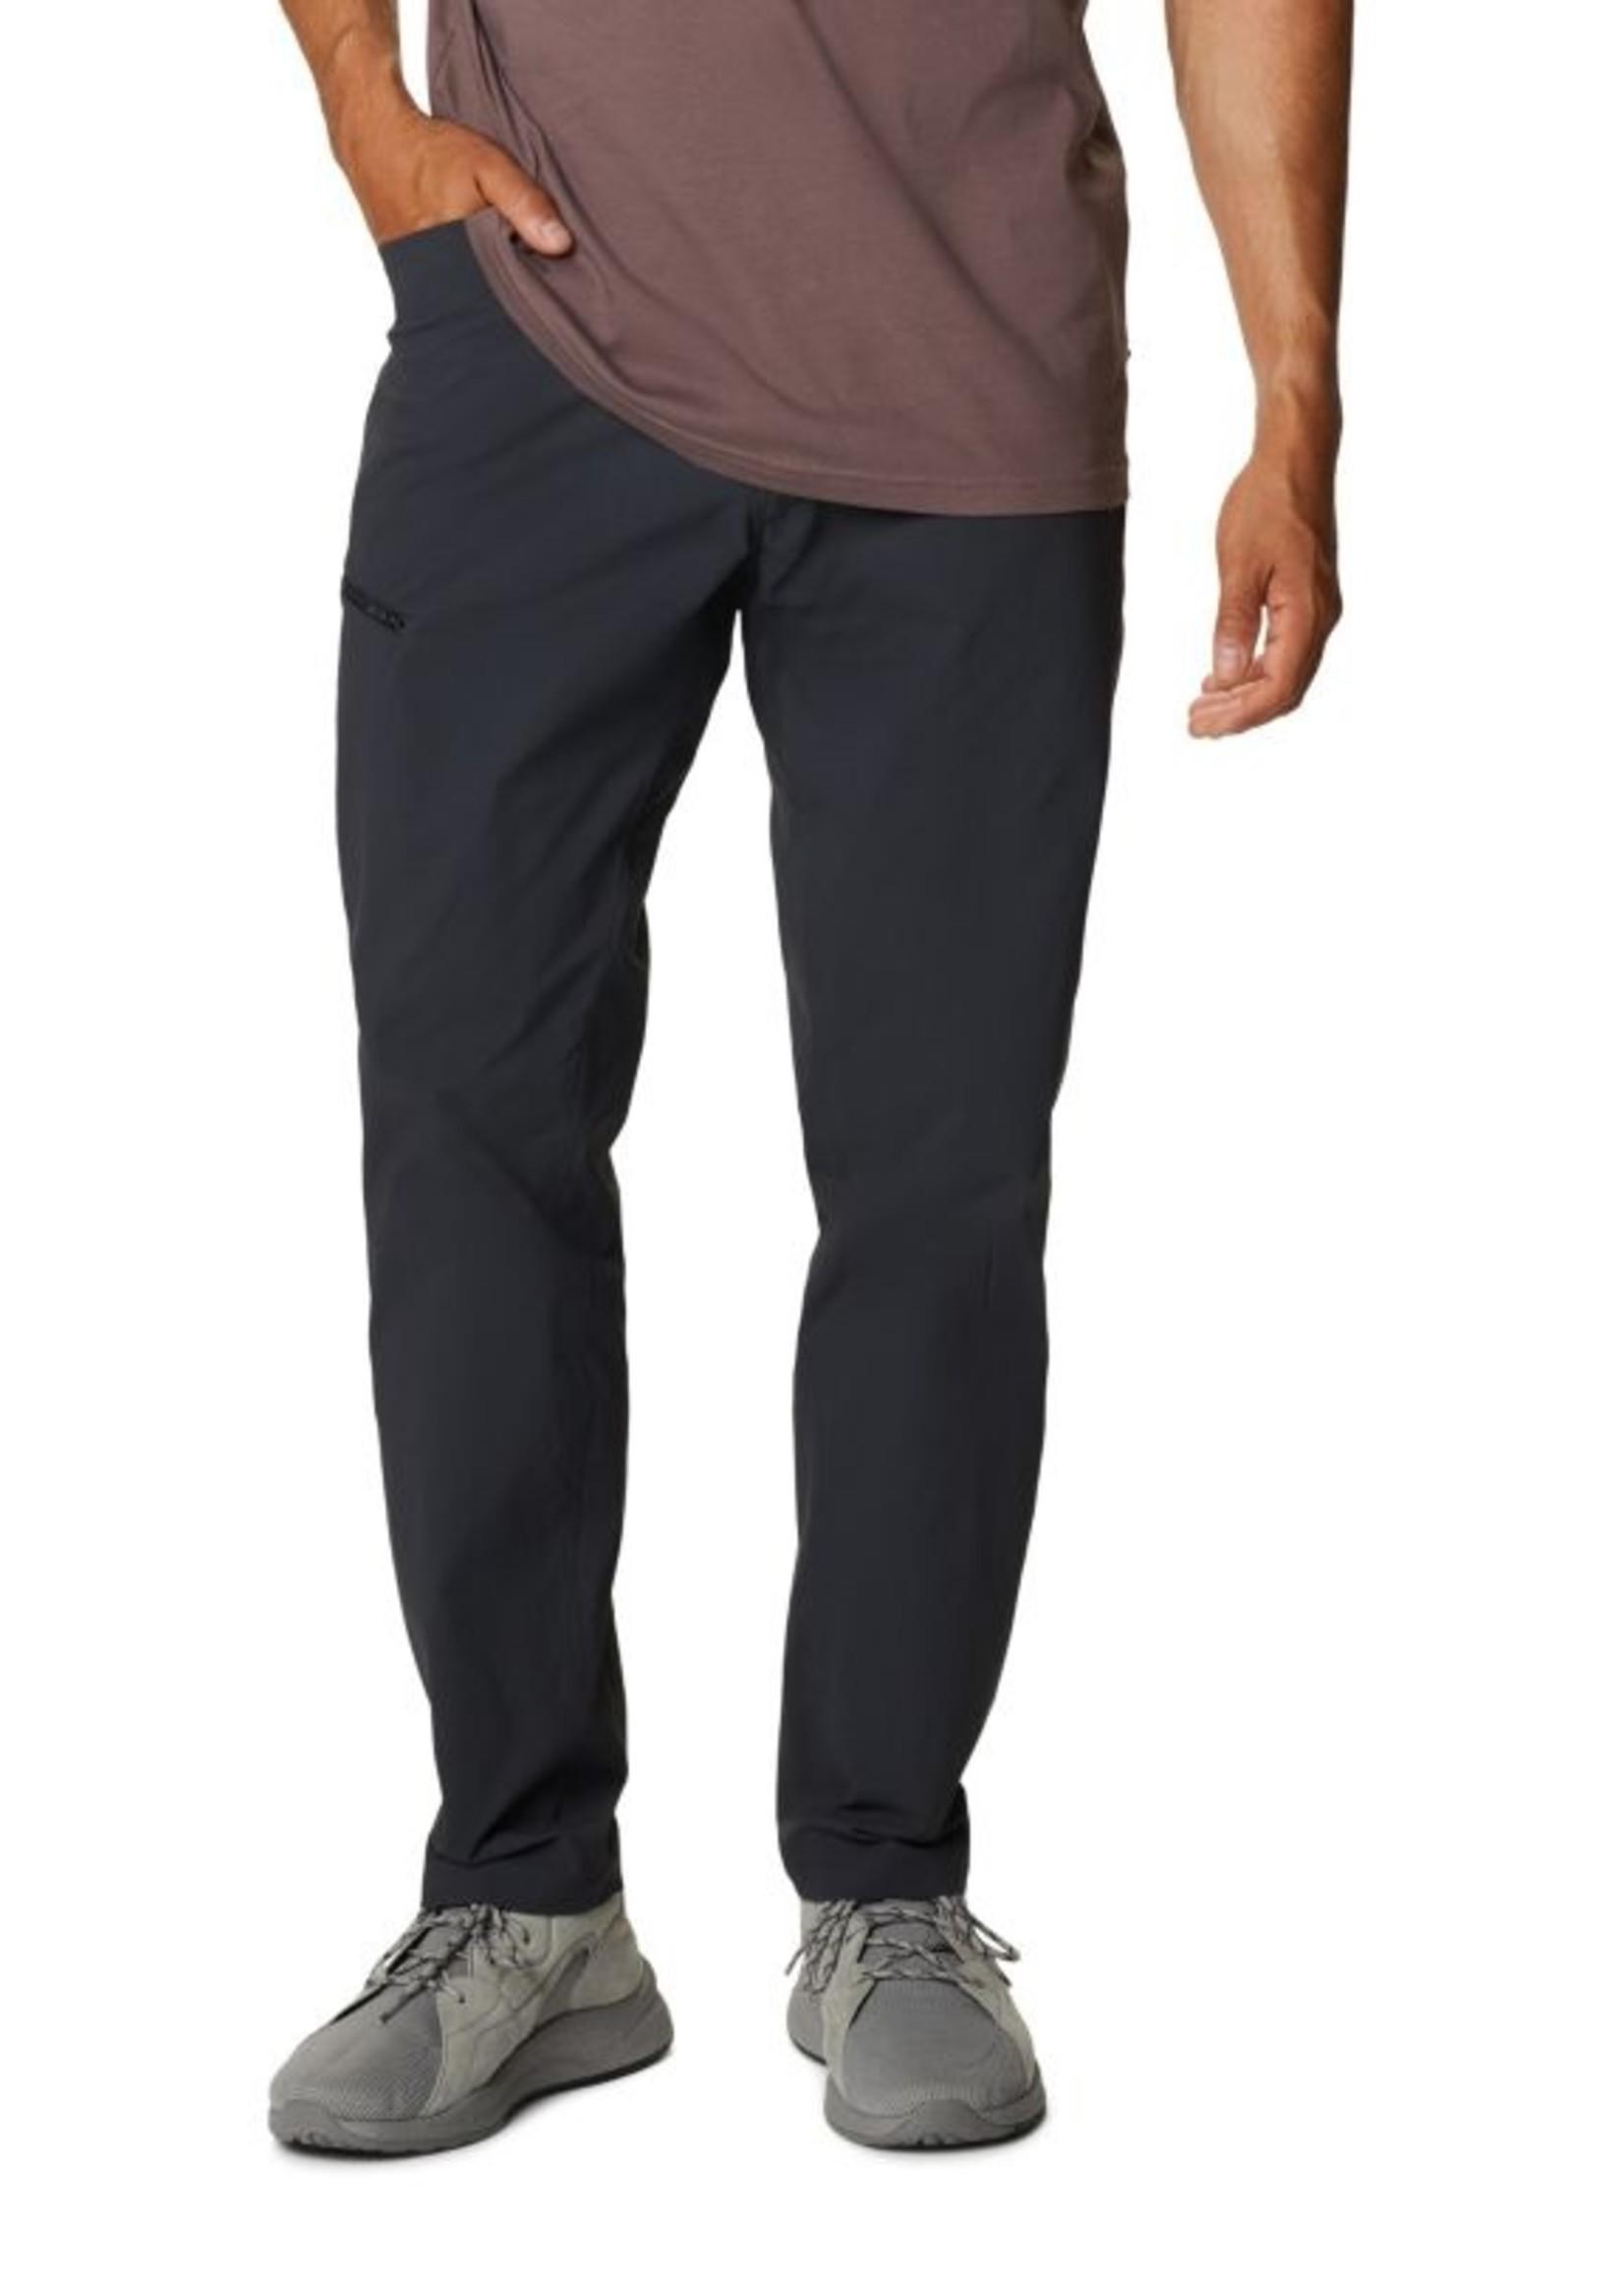 Mountain Hardwear BASIN PANT